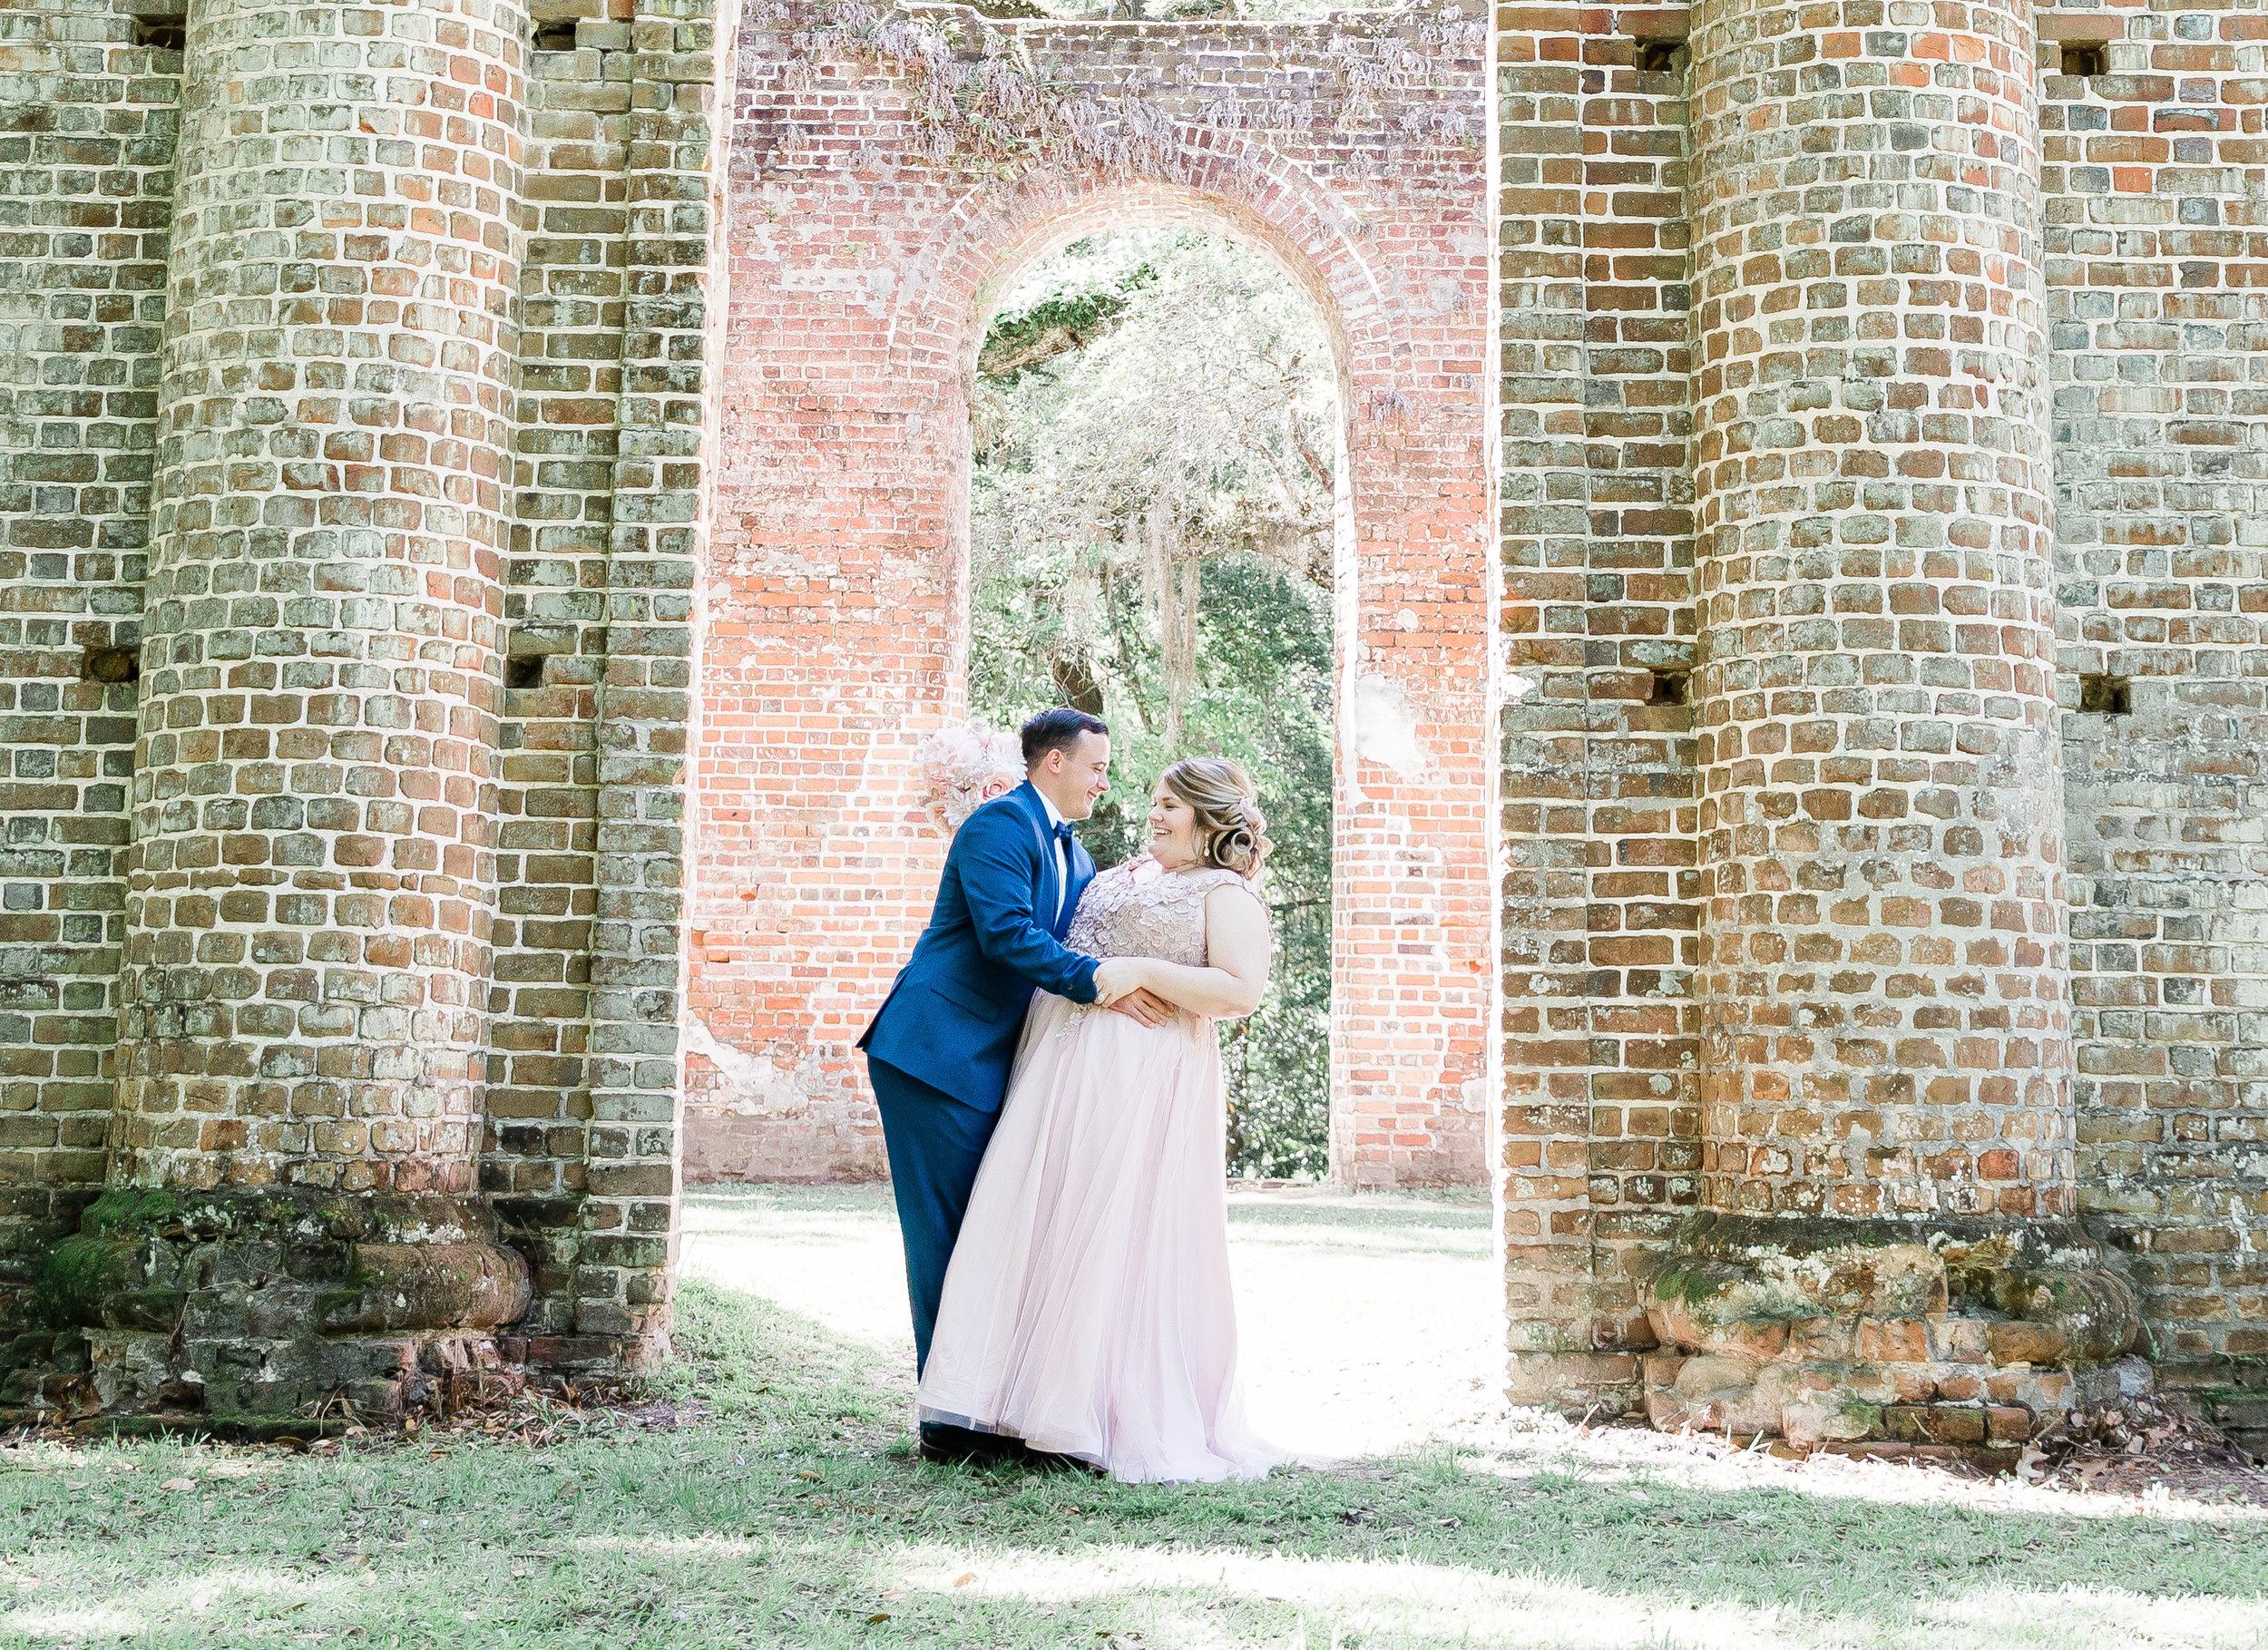 20190417-Southern Lens Photography-savannah family photographer- Ashley and Zack-old sheldon church ruins-201959.jpg